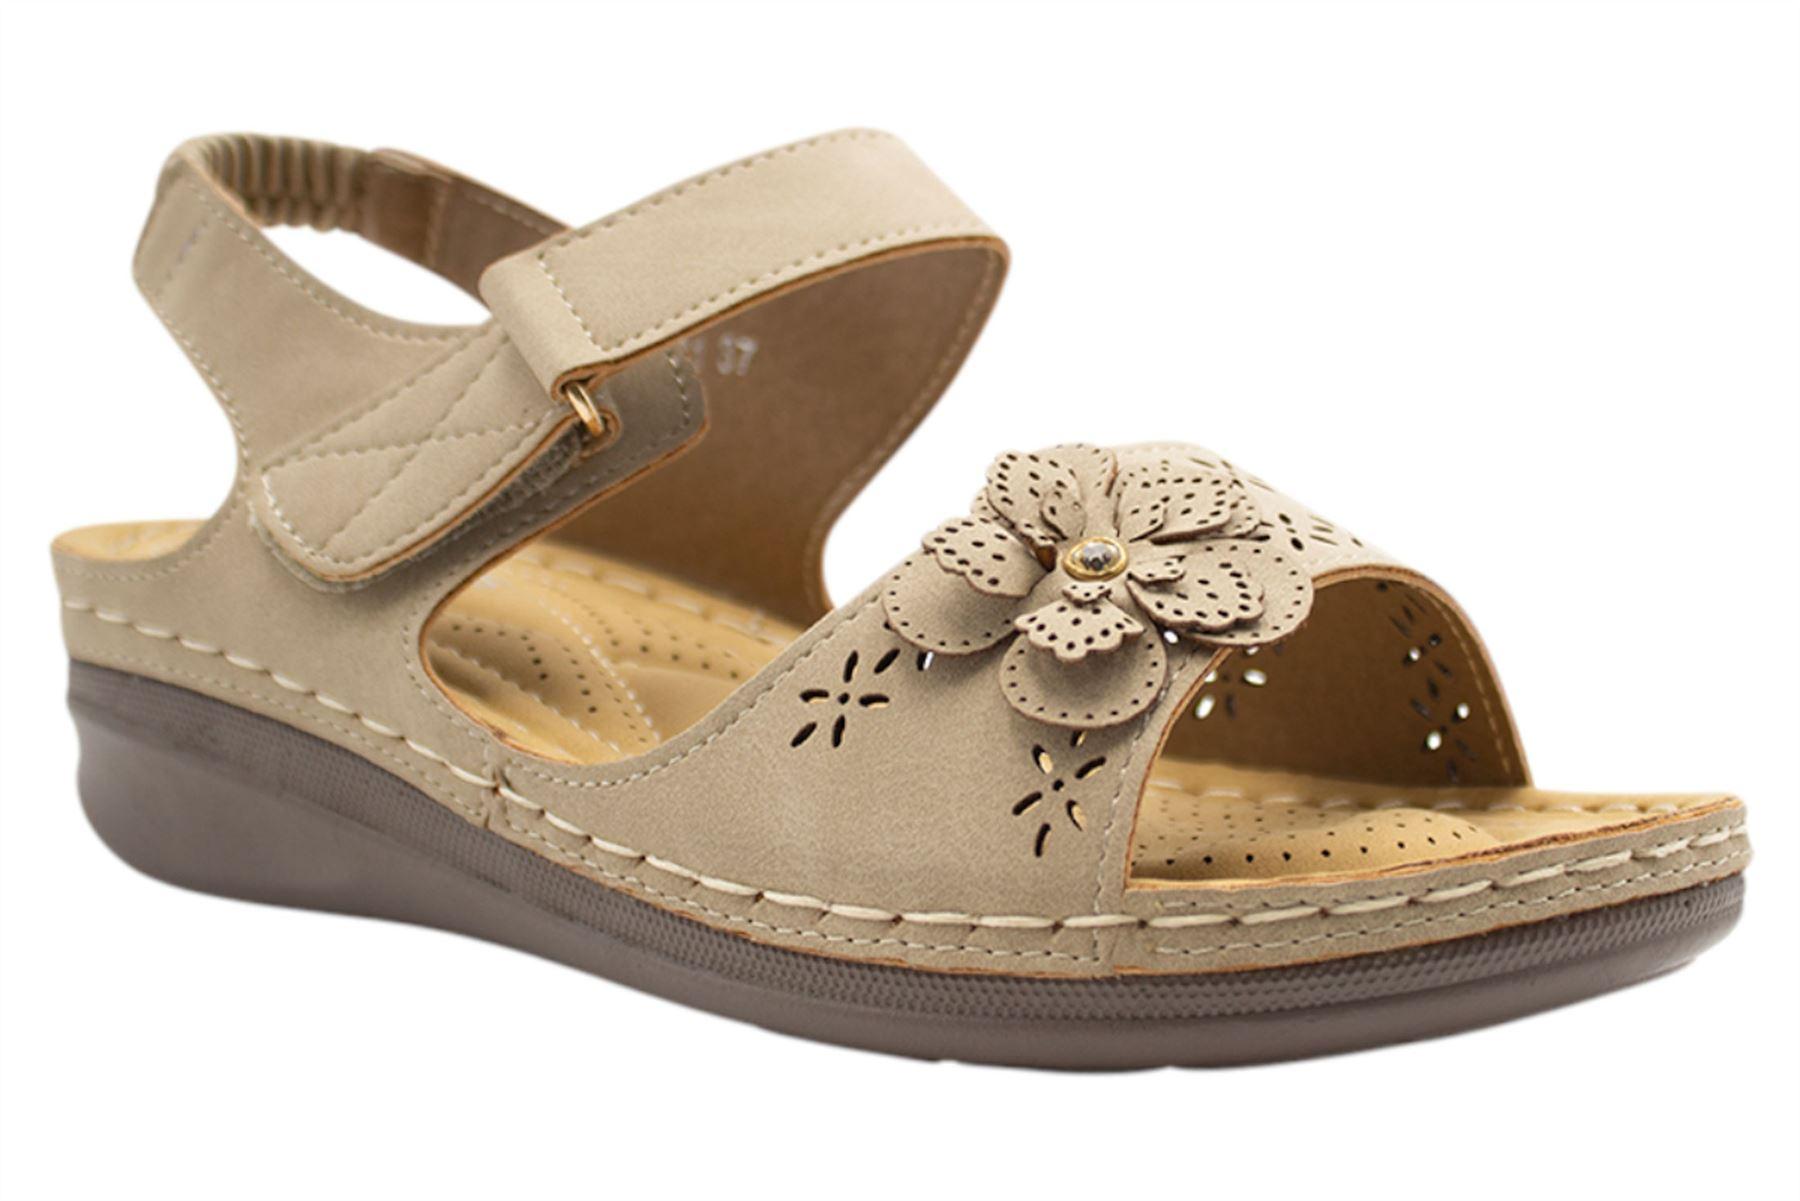 Ladies-Sandals-Womens-Mid-Heel-Comfort-Summer-Beach-Casual-Wear miniatura 3